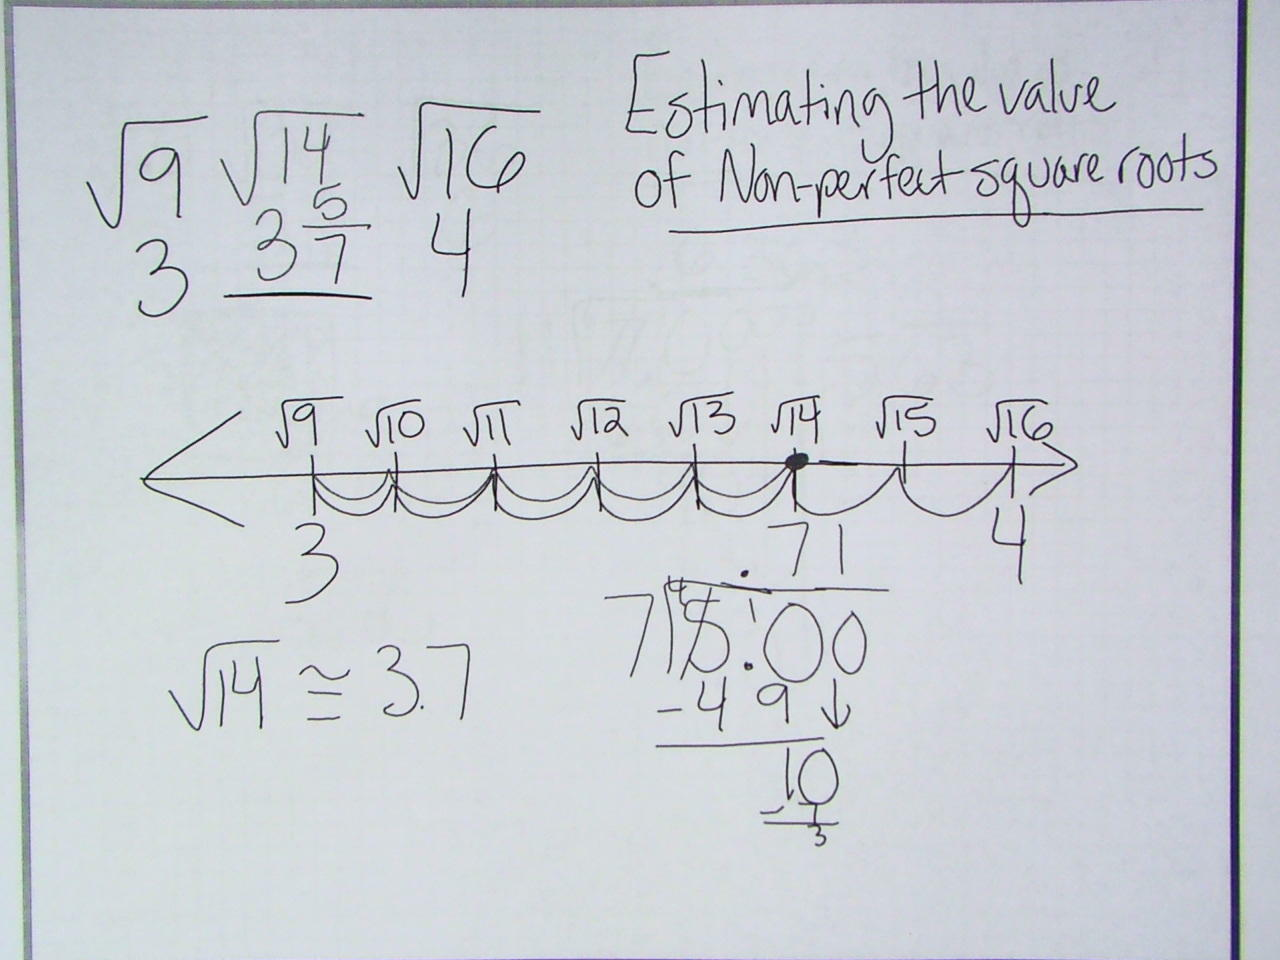 Worksheet Estimating Square Roots Worksheet Recetasnaturista